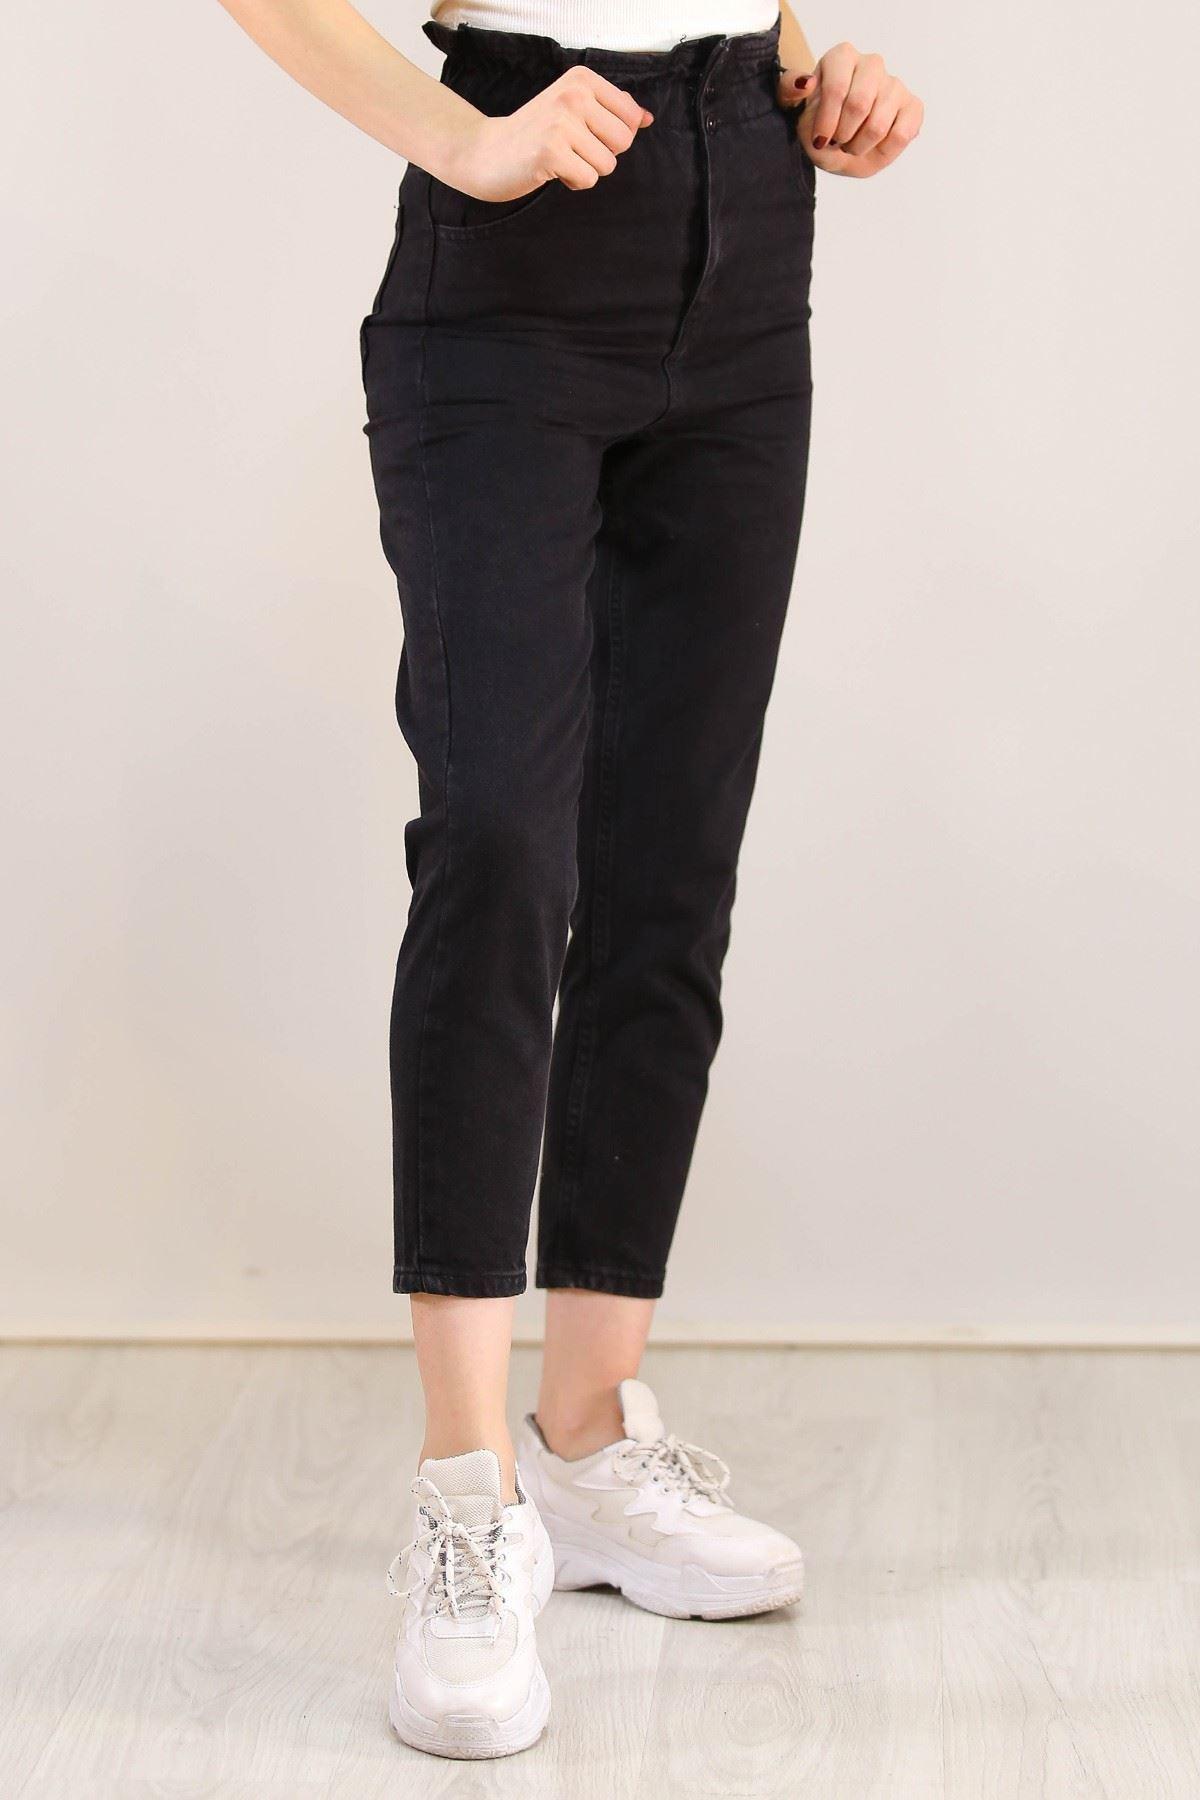 Beli Lastikli Kot Pantolon Siyah - 5092.925.